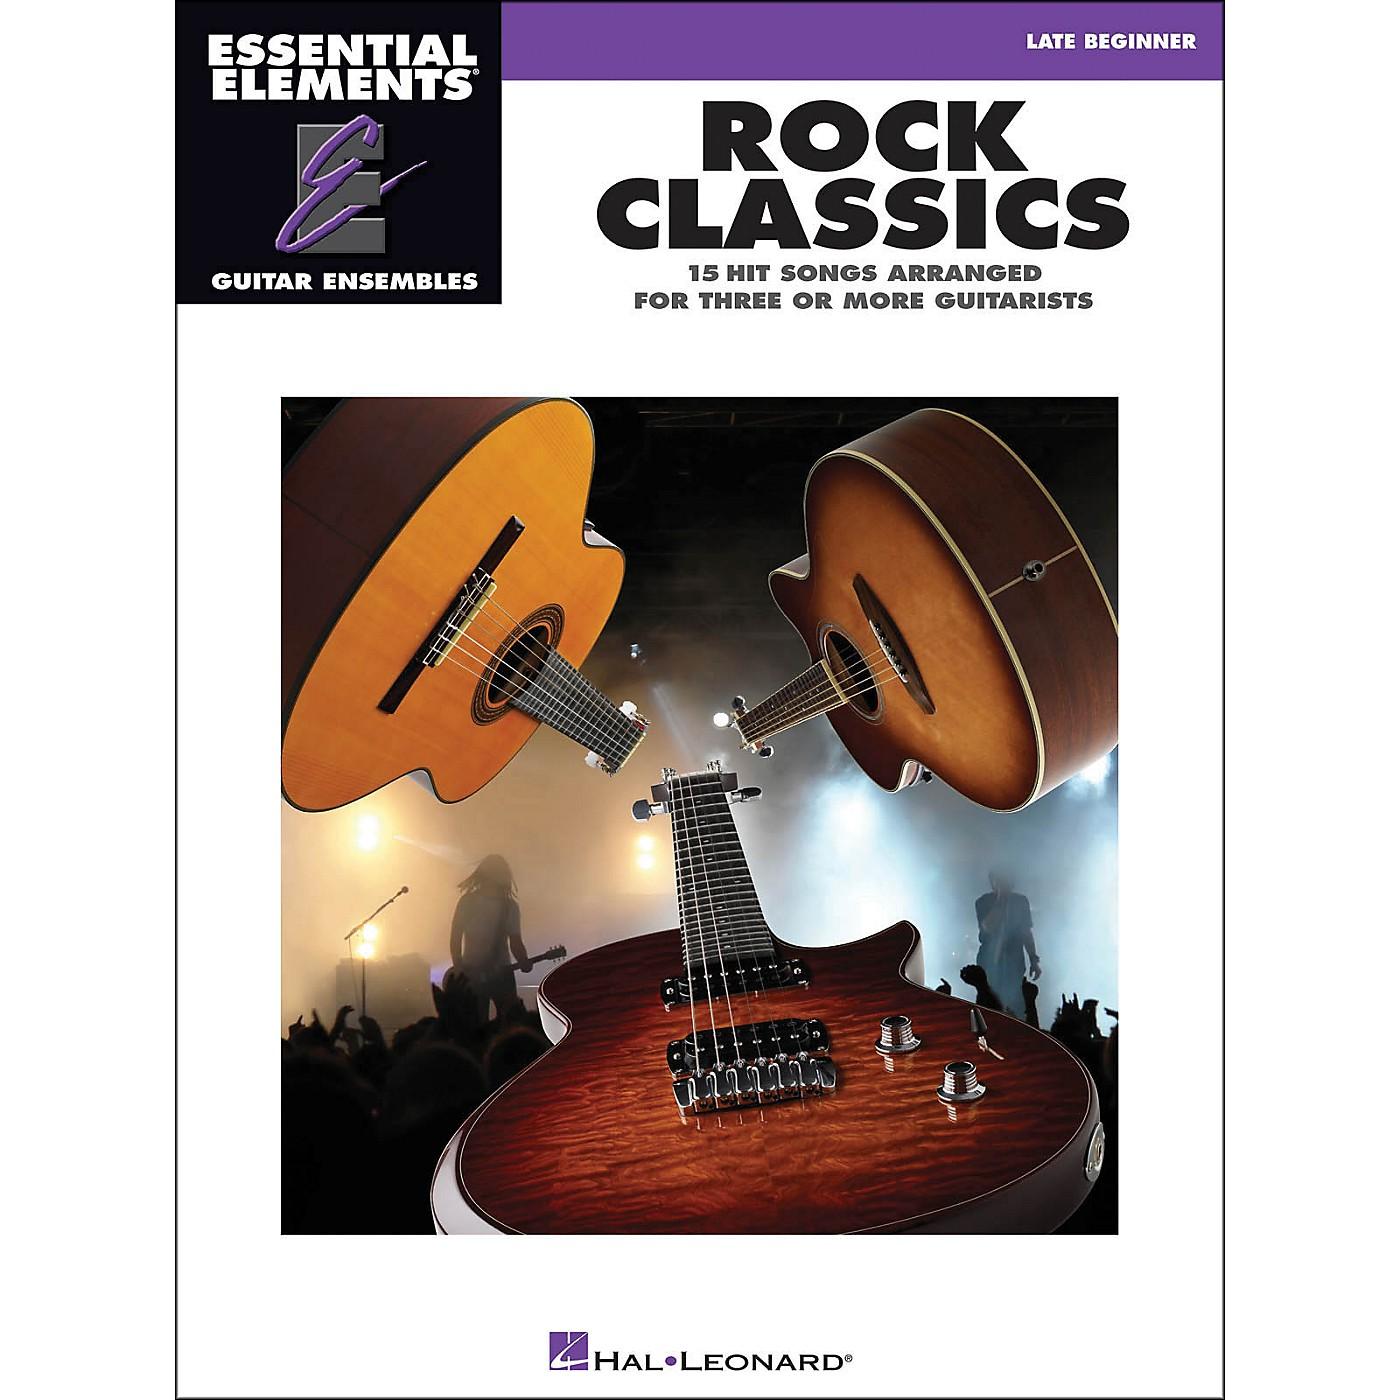 Hal Leonard Rock Classics - Essential Elements Guitar Ensembles Late Beginner thumbnail